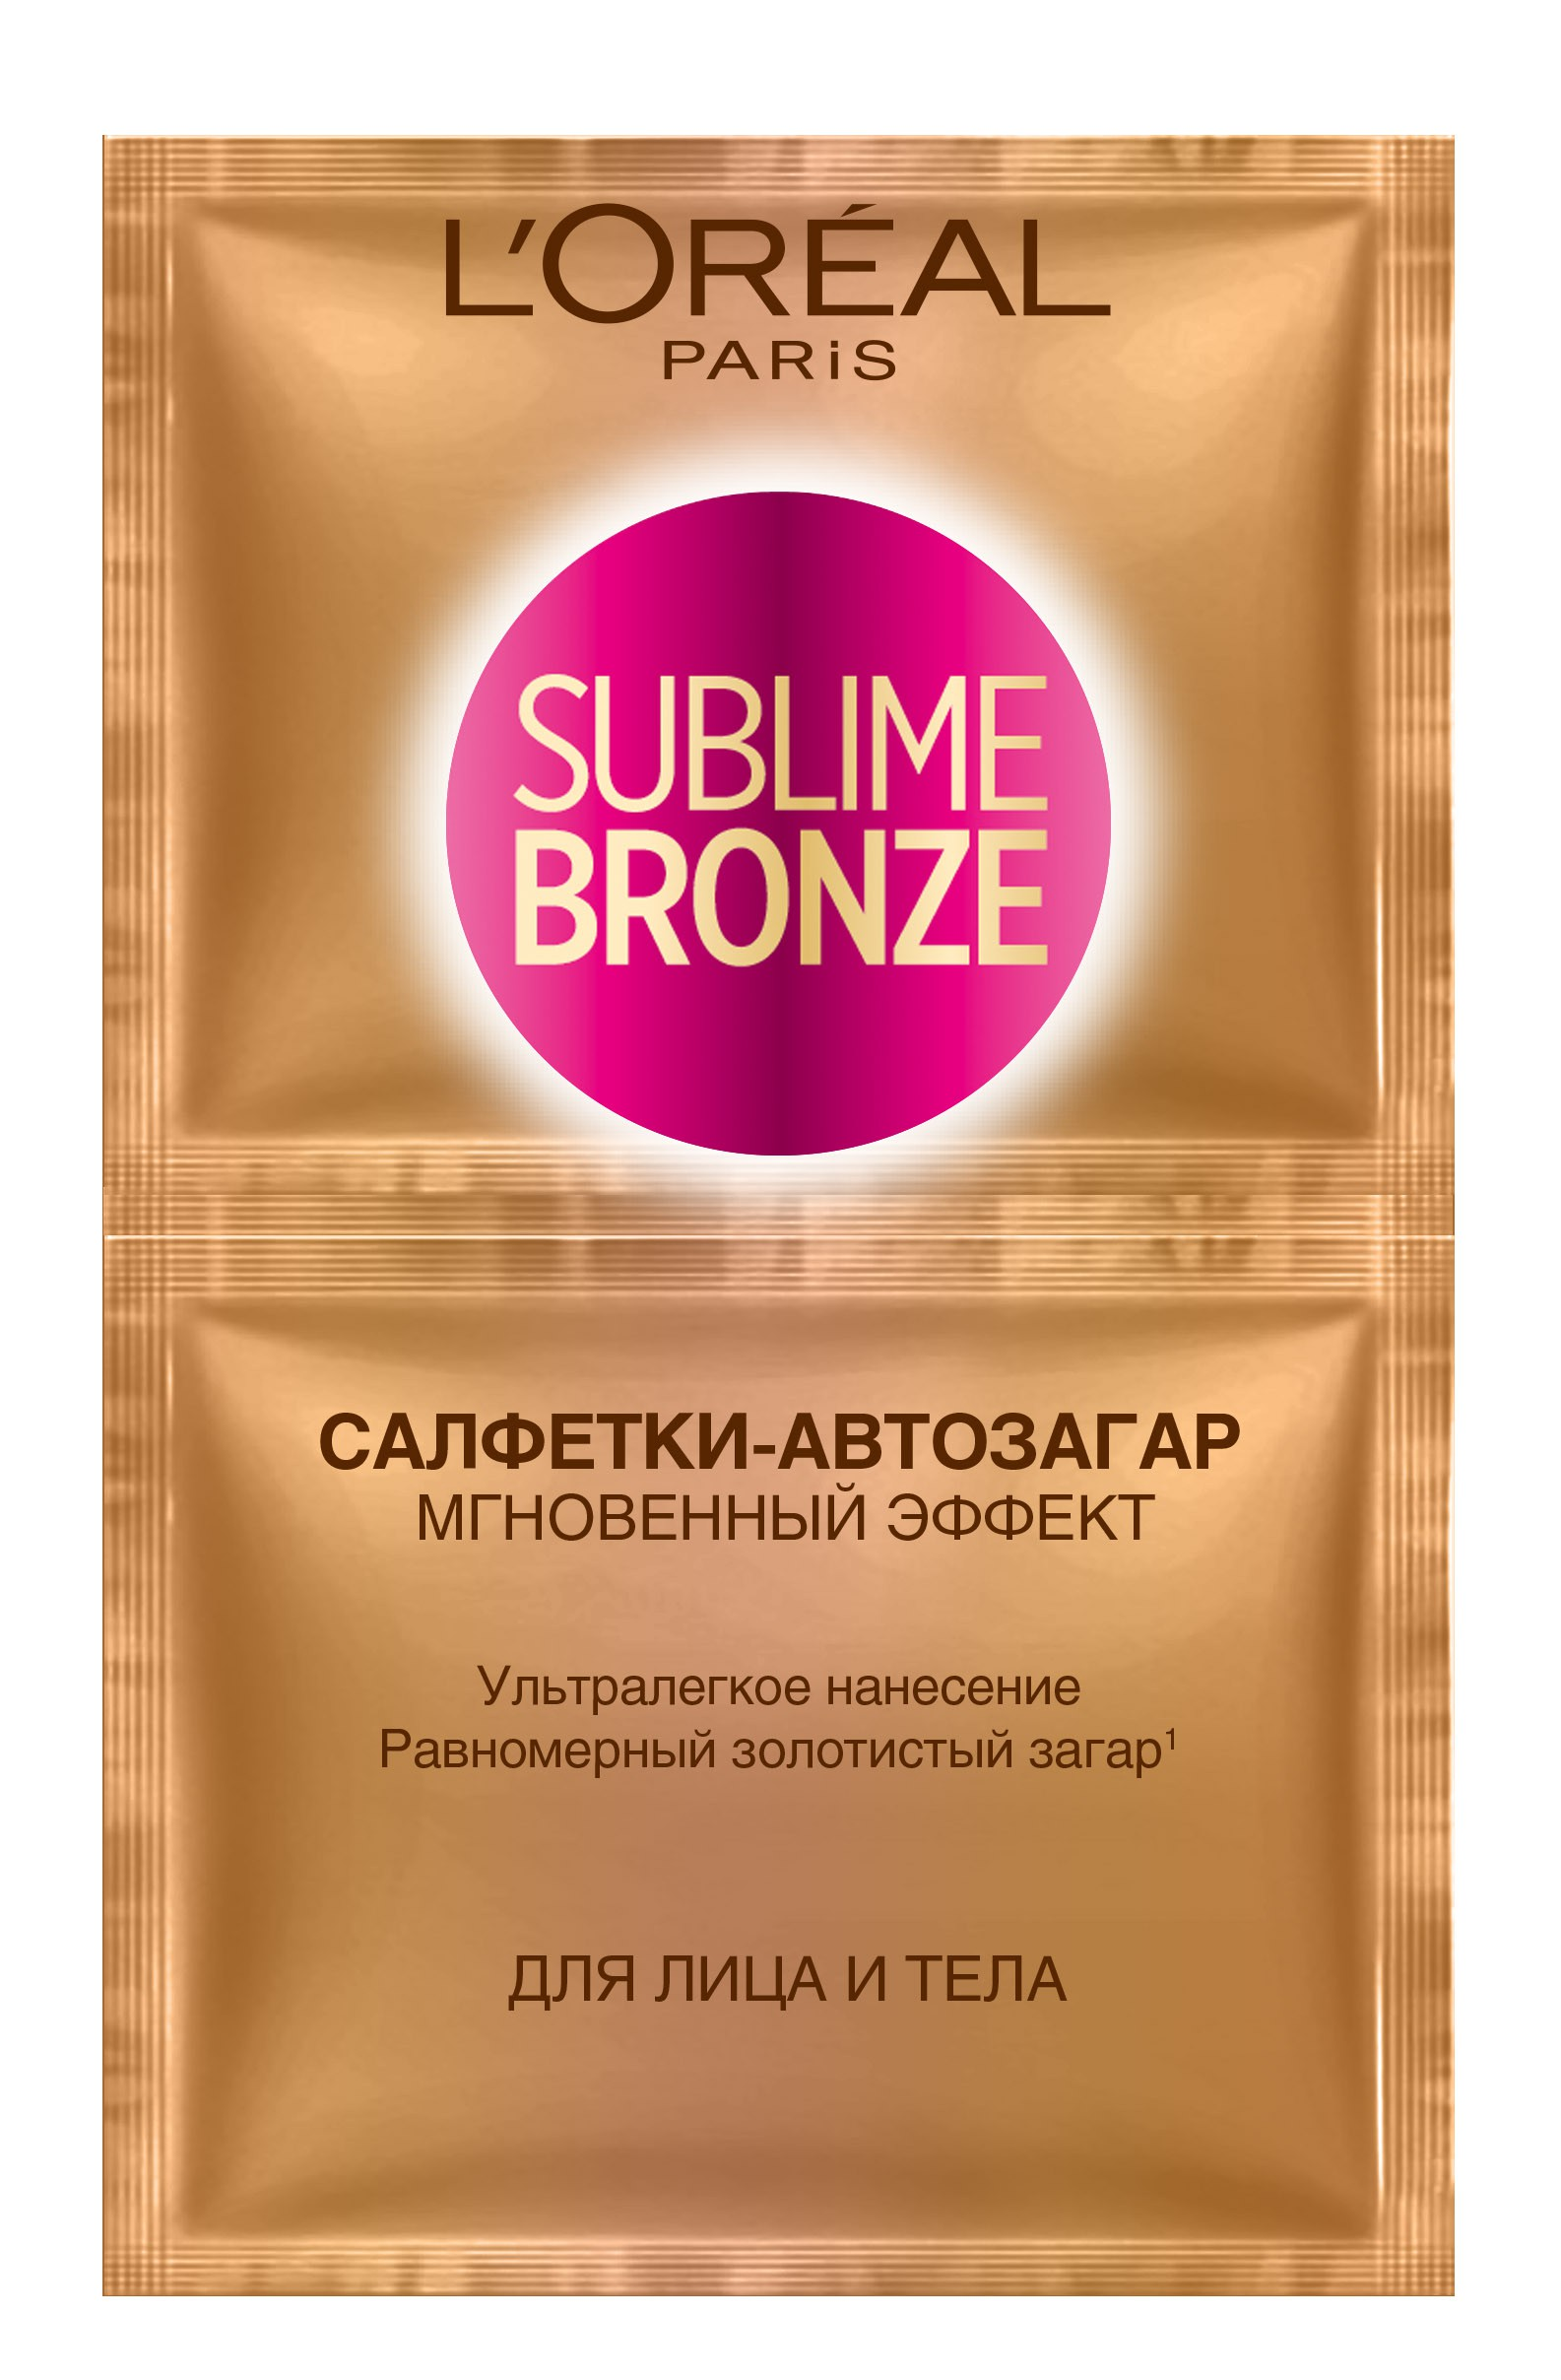 L'Oreal Paris Sublime Bronze Салфетки-автозагар, для лица и тела, 2 х 5,6 мл